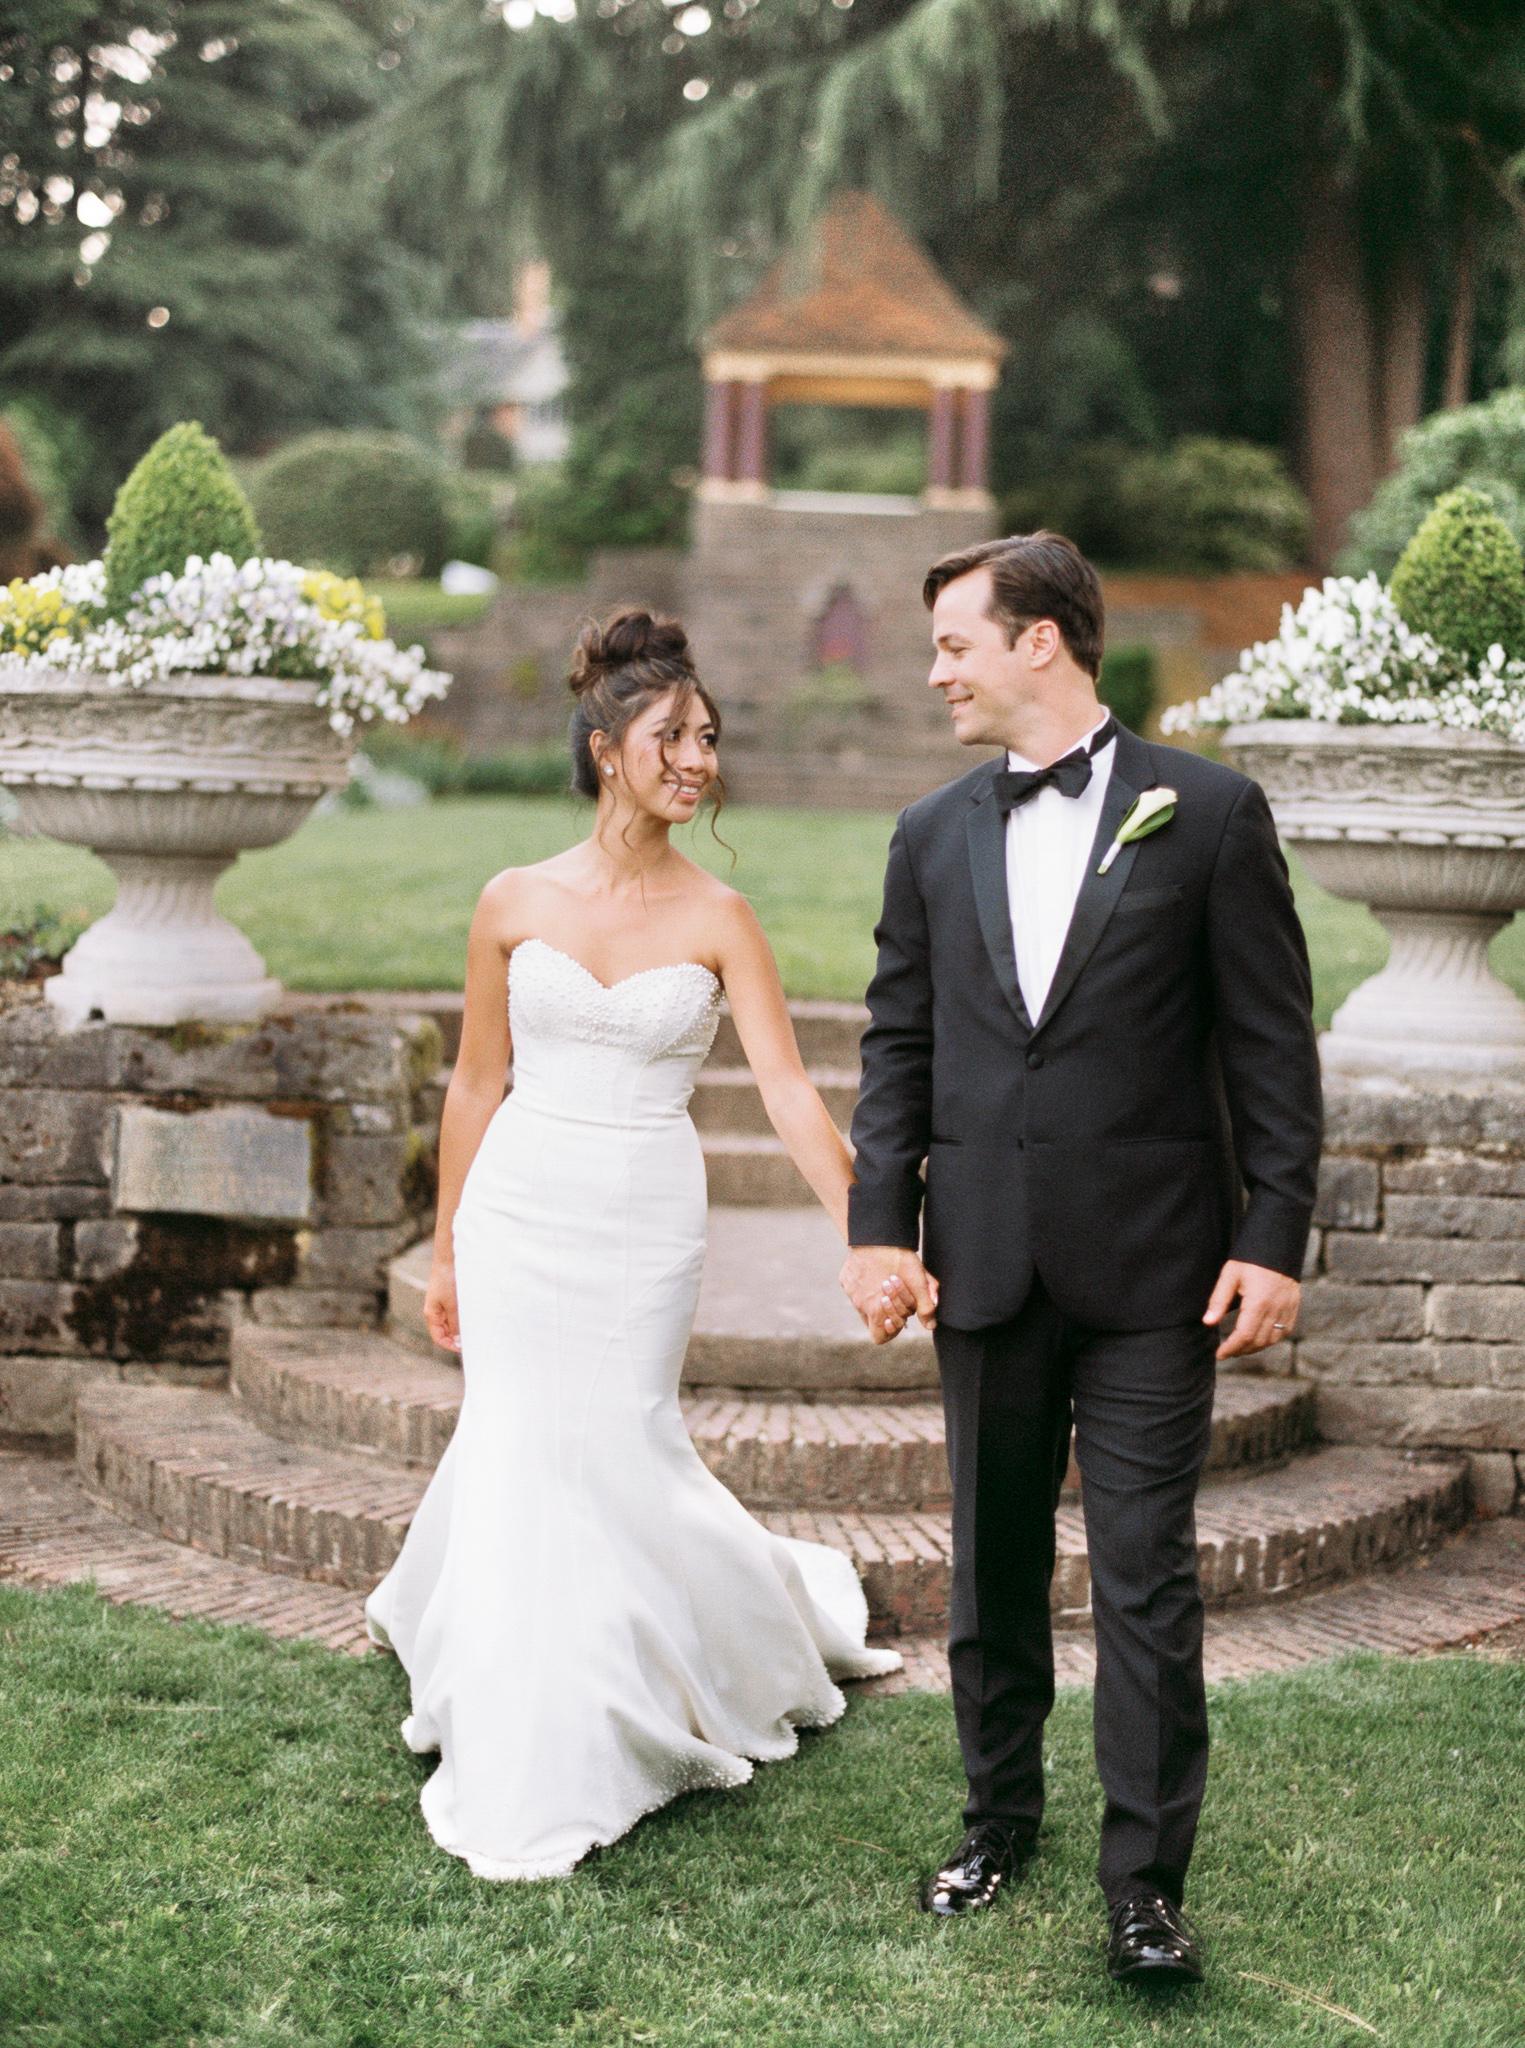 107OutliveCreative_Travel_Photographer_Videographer_Lewis&Clark_Oregon_Elegant_BlackTie_Destination_Wedding.jpg